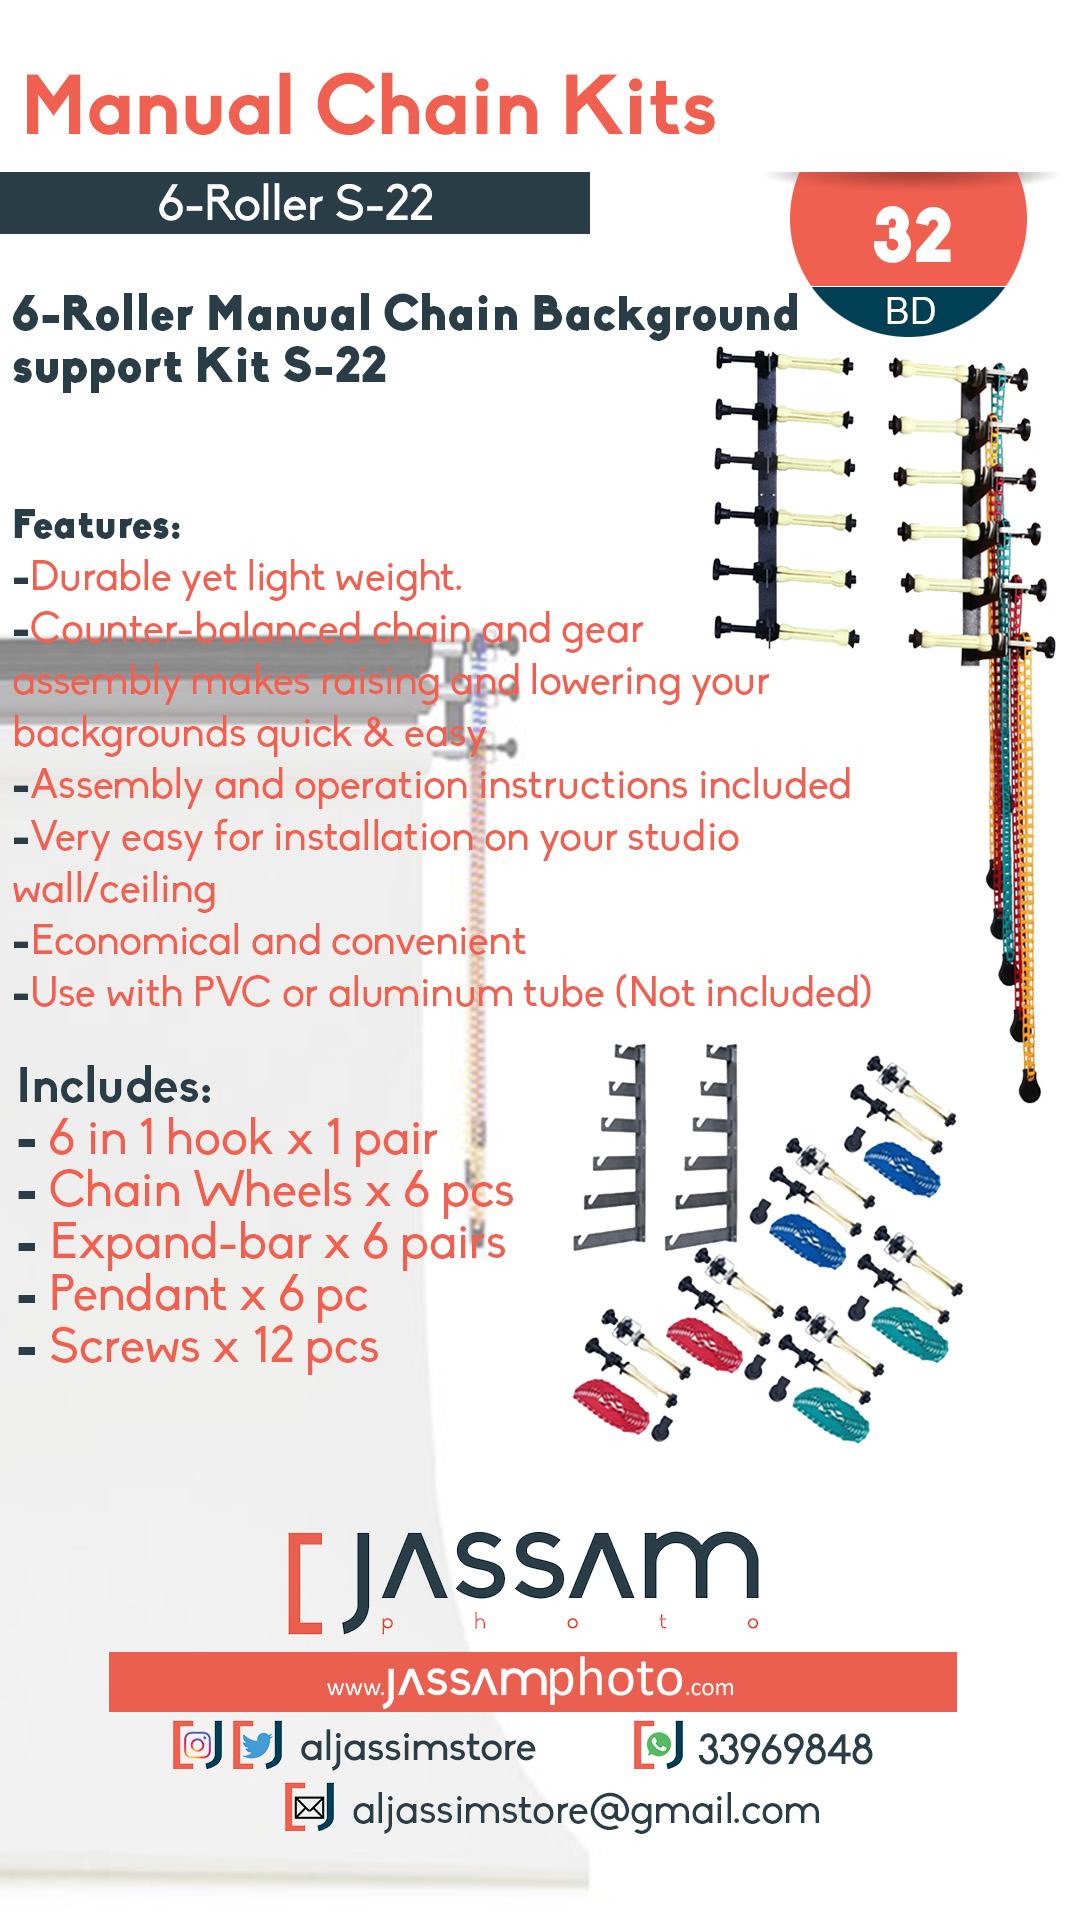 6-Roller Manual Chain Kit S-22